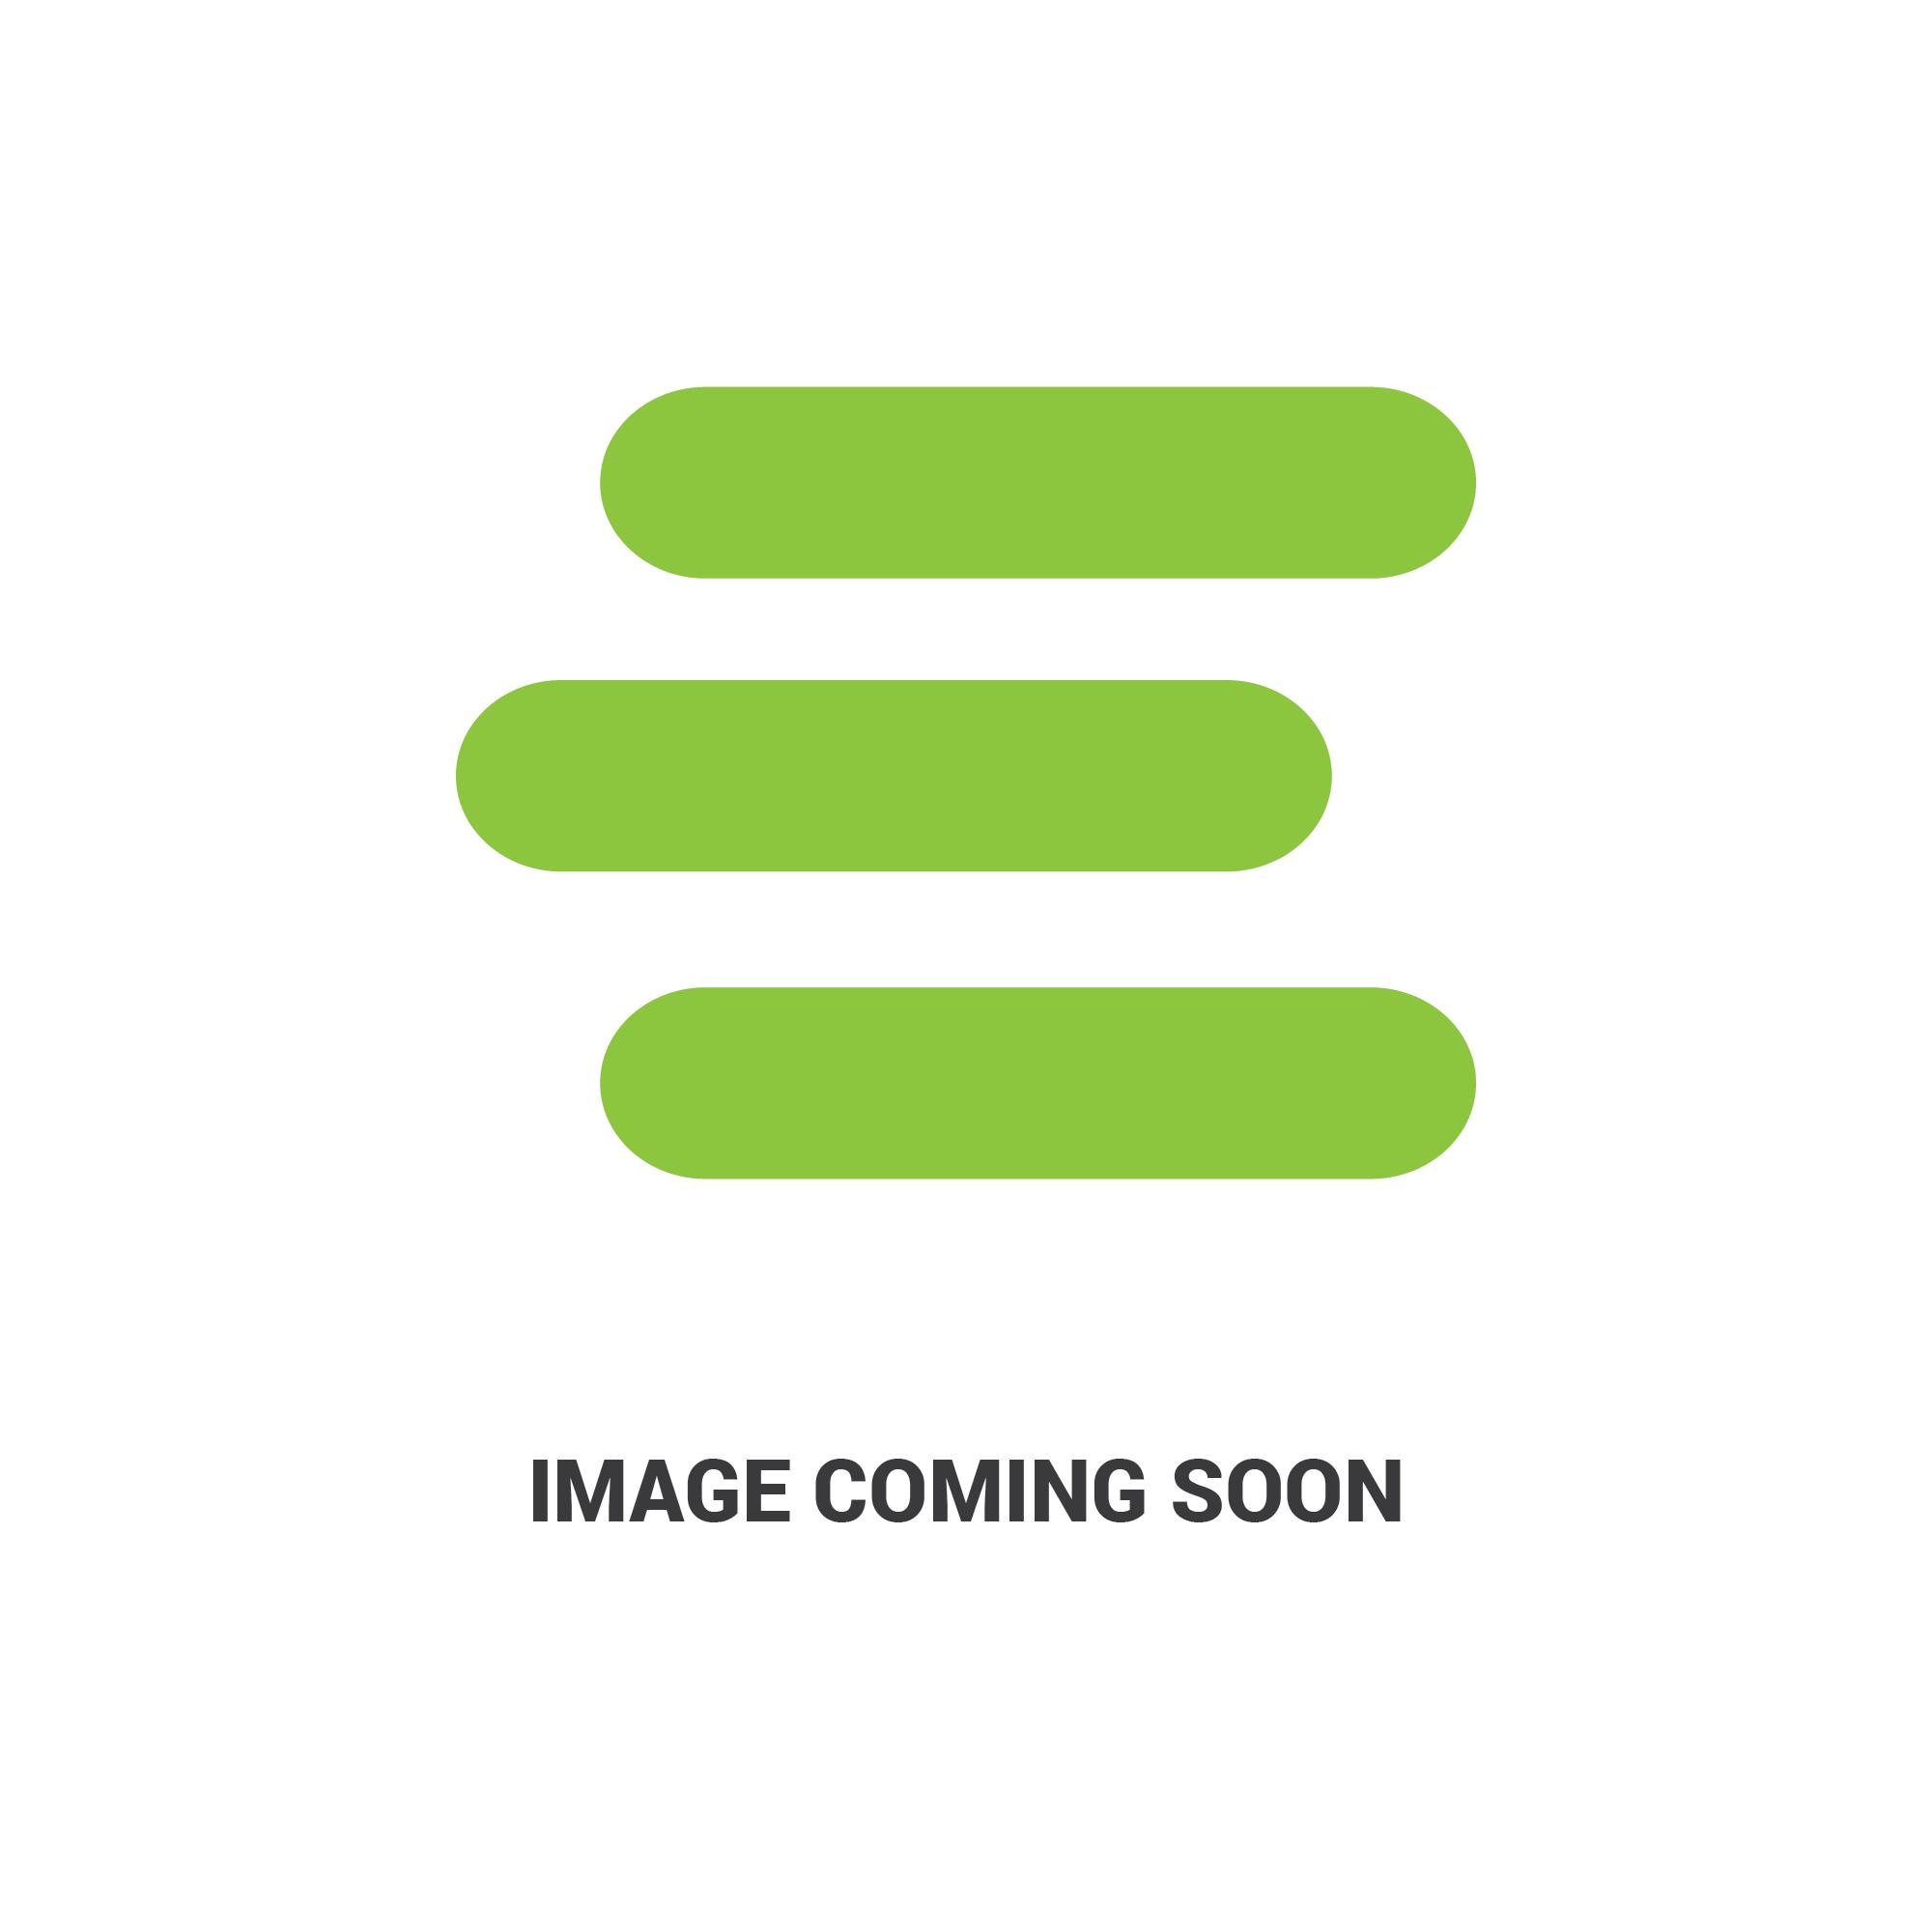 E-83982898edit 1.jpg